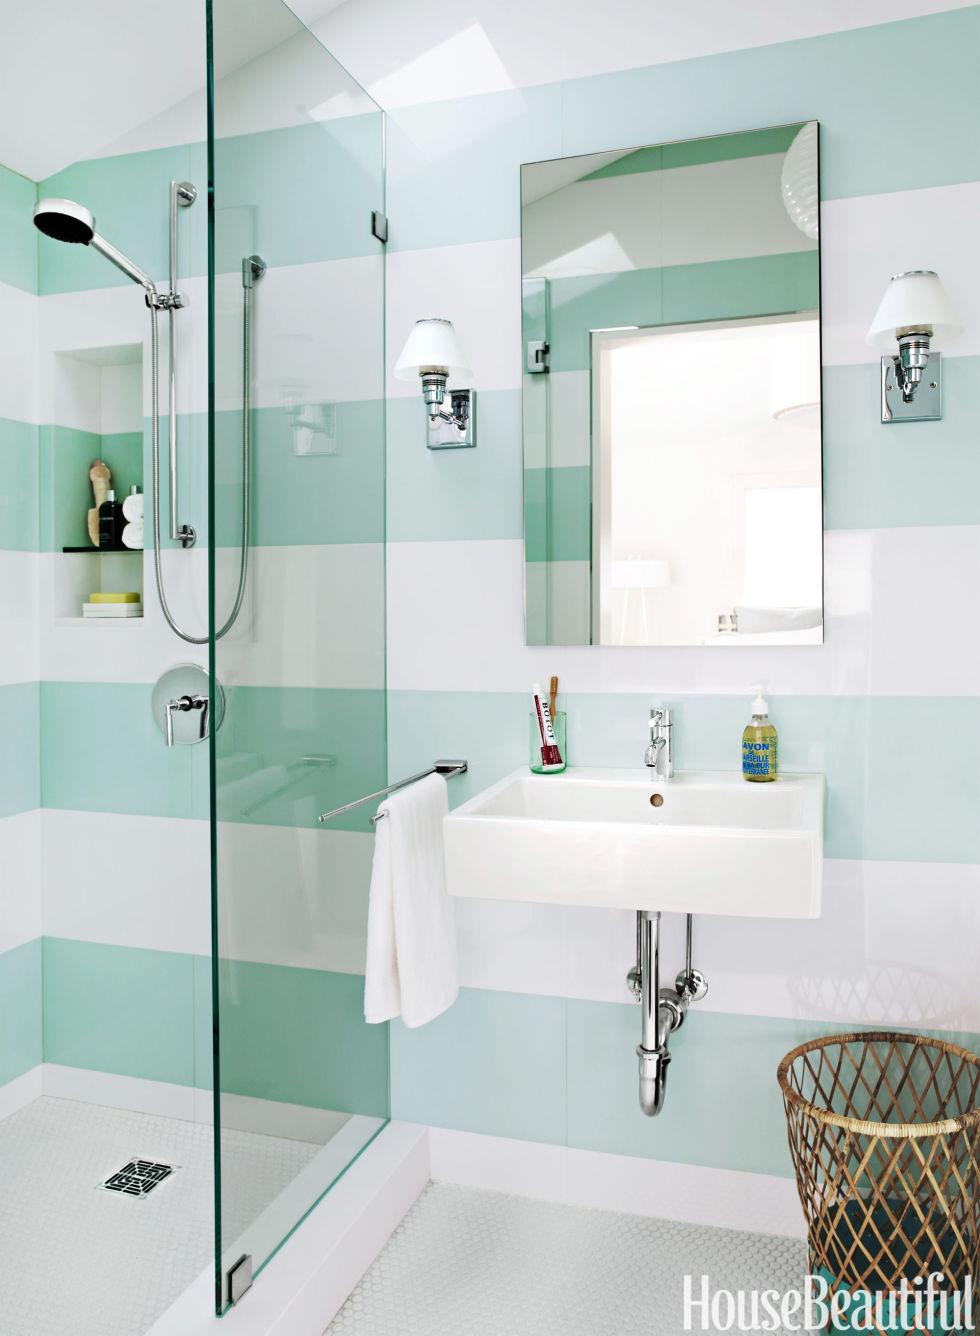 Tremendous 135 Best Bathroom Design Ideas Decor Pictures Of Stylish Modern Largest Home Design Picture Inspirations Pitcheantrous